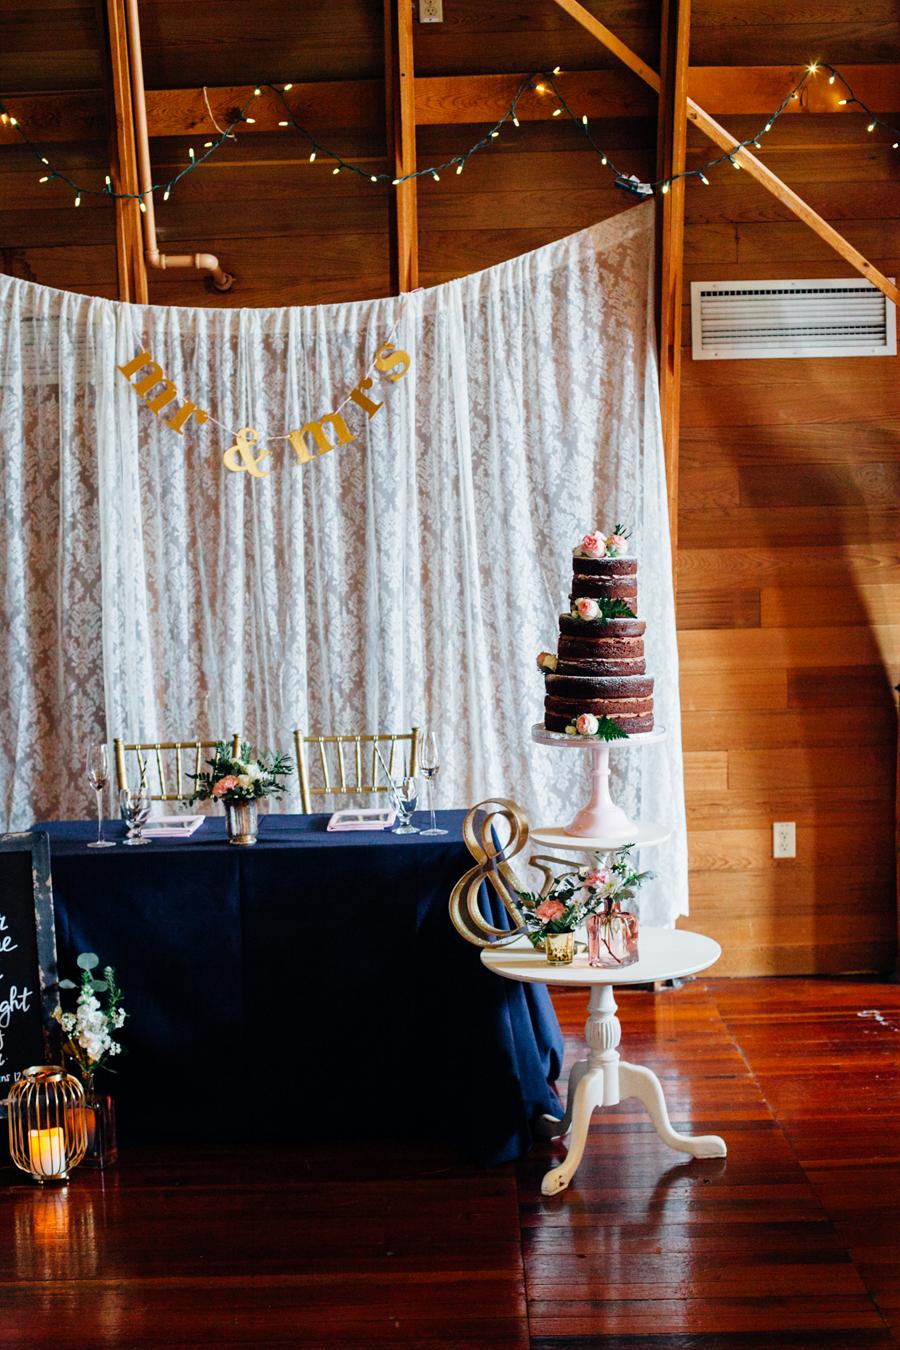 014-seattle-bothell-wedding-photographer-russells-restaurant-wilkins-photo.jpg